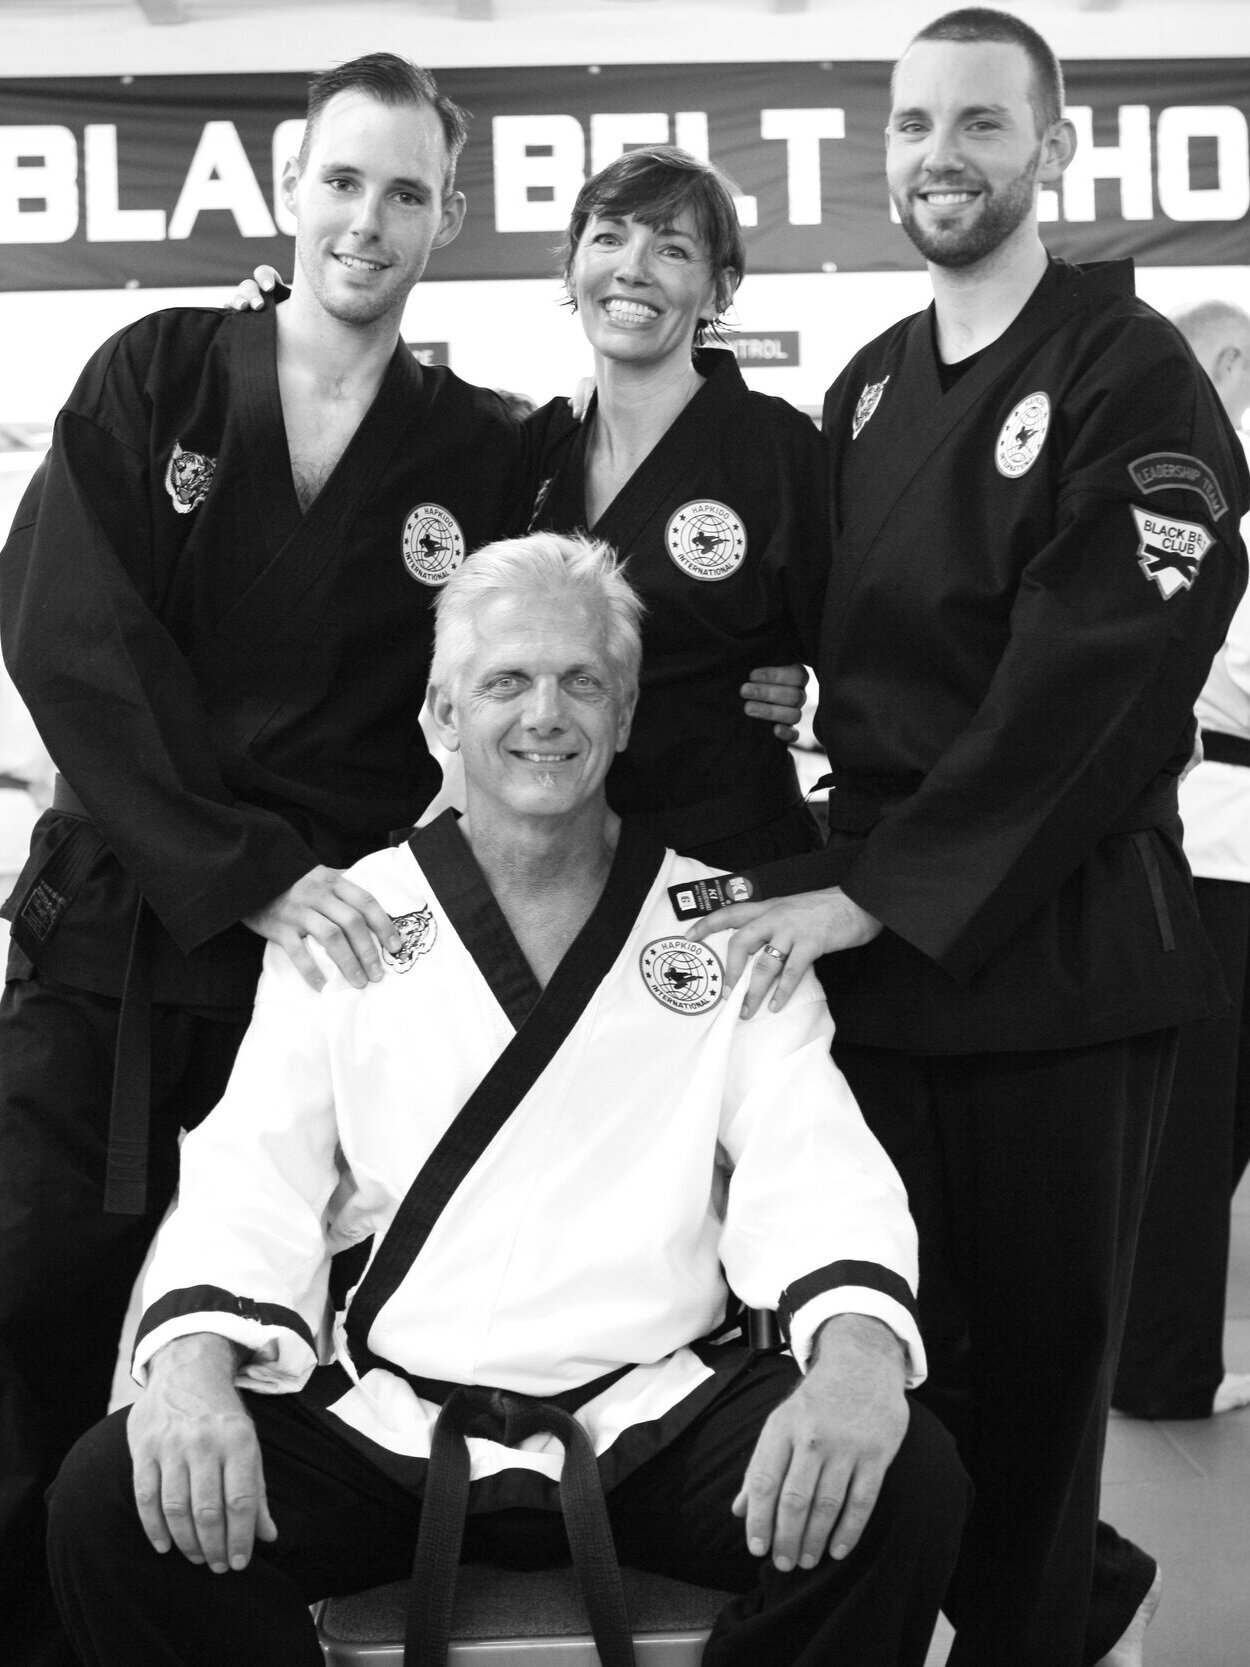 The founding MAFF Family: Master Garret, Master Mel, Master Austin, and Grandmaster Dave. Circa 2009.